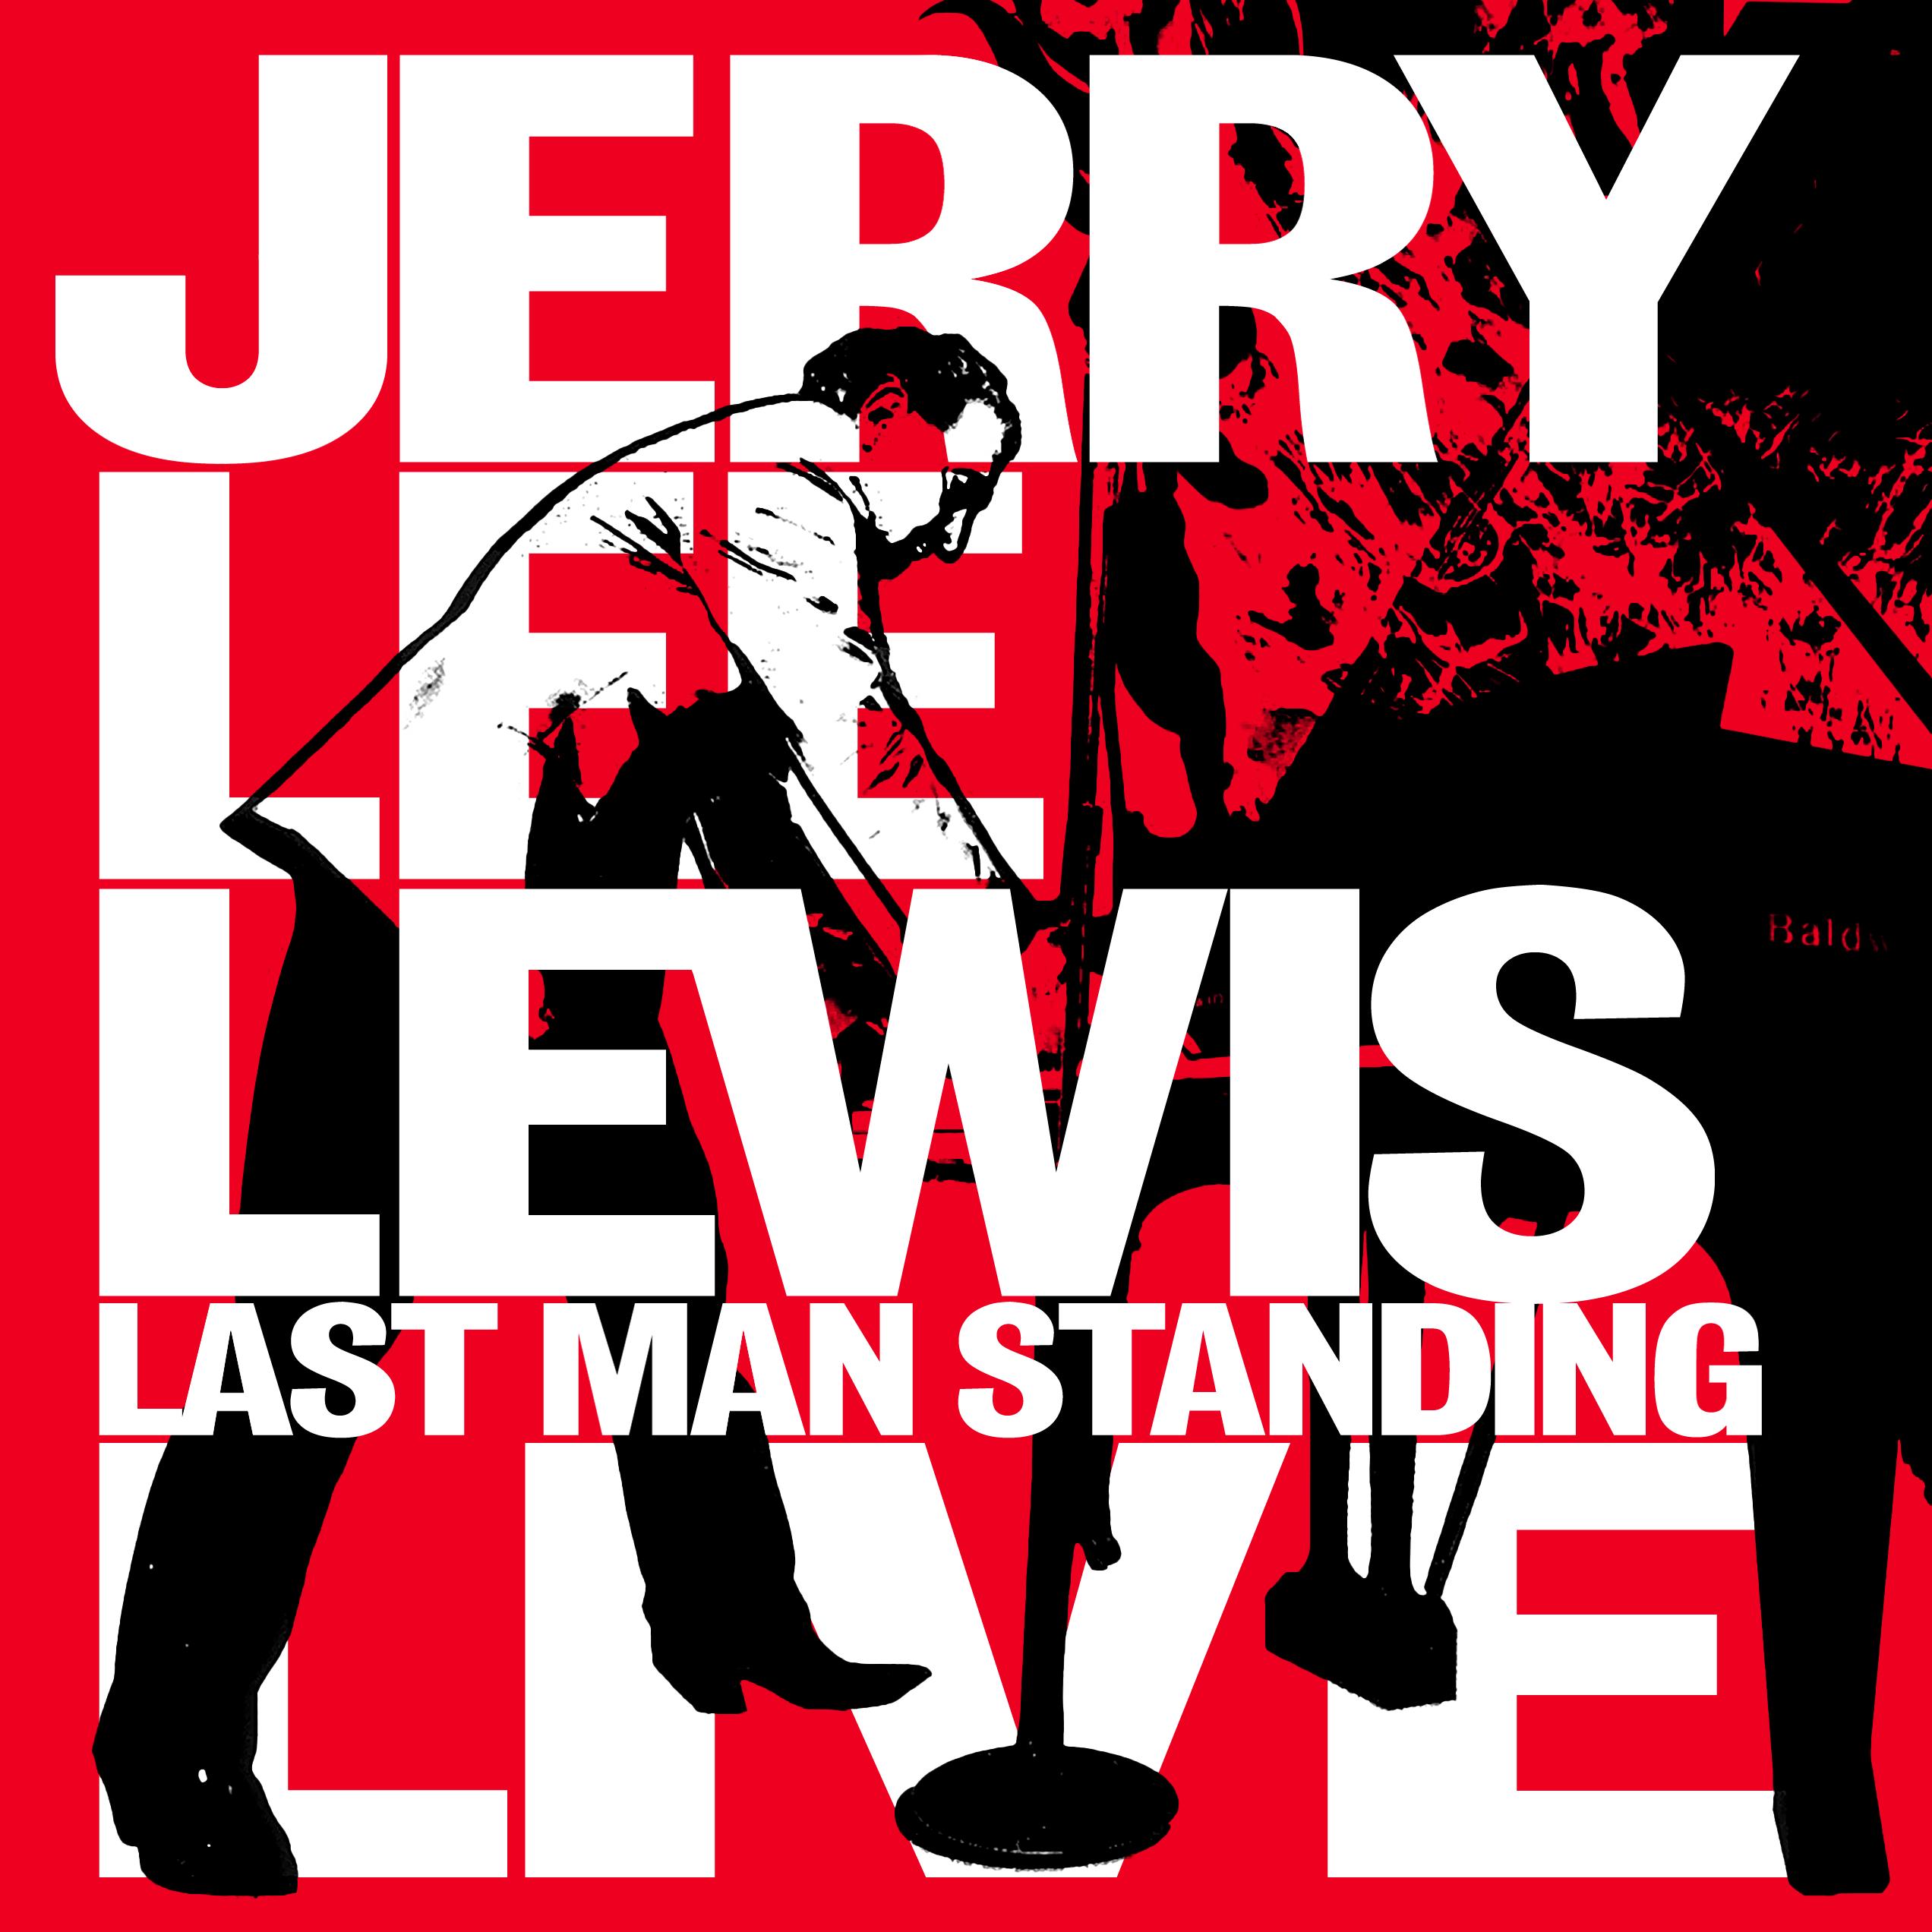 Album Artist: Jerry Lee Lewis / Album Title: Last Man Standing Live